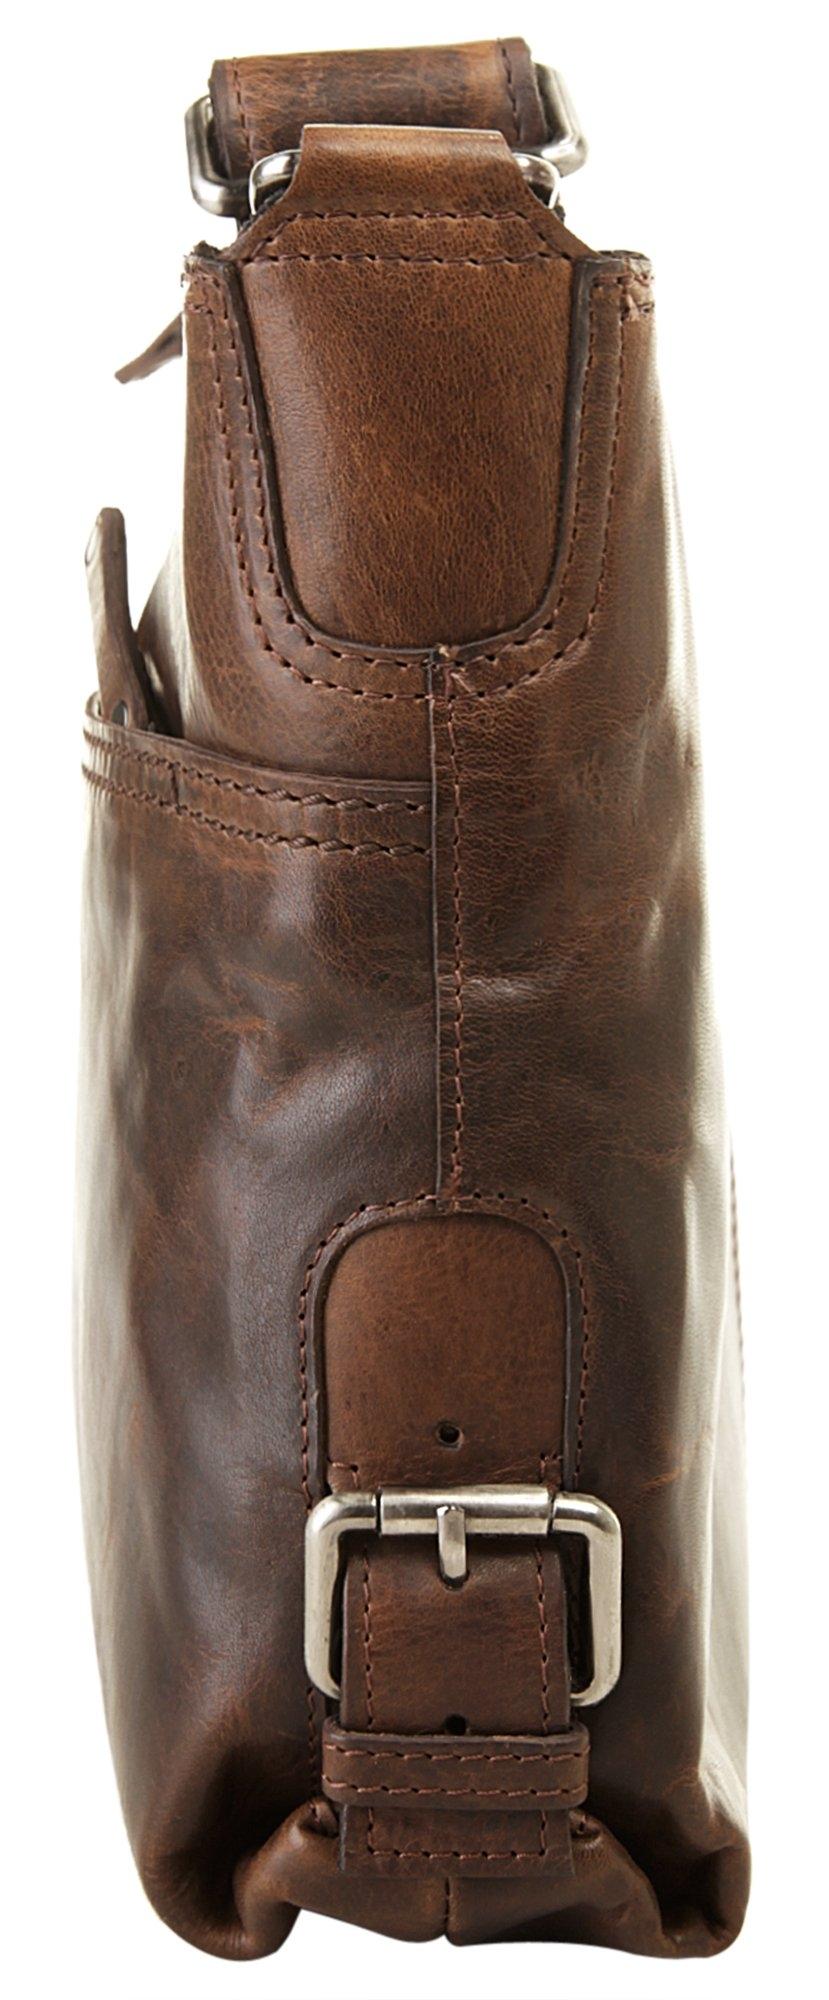 Winkel Harold's In Shoppersaddle Online De ARLj354